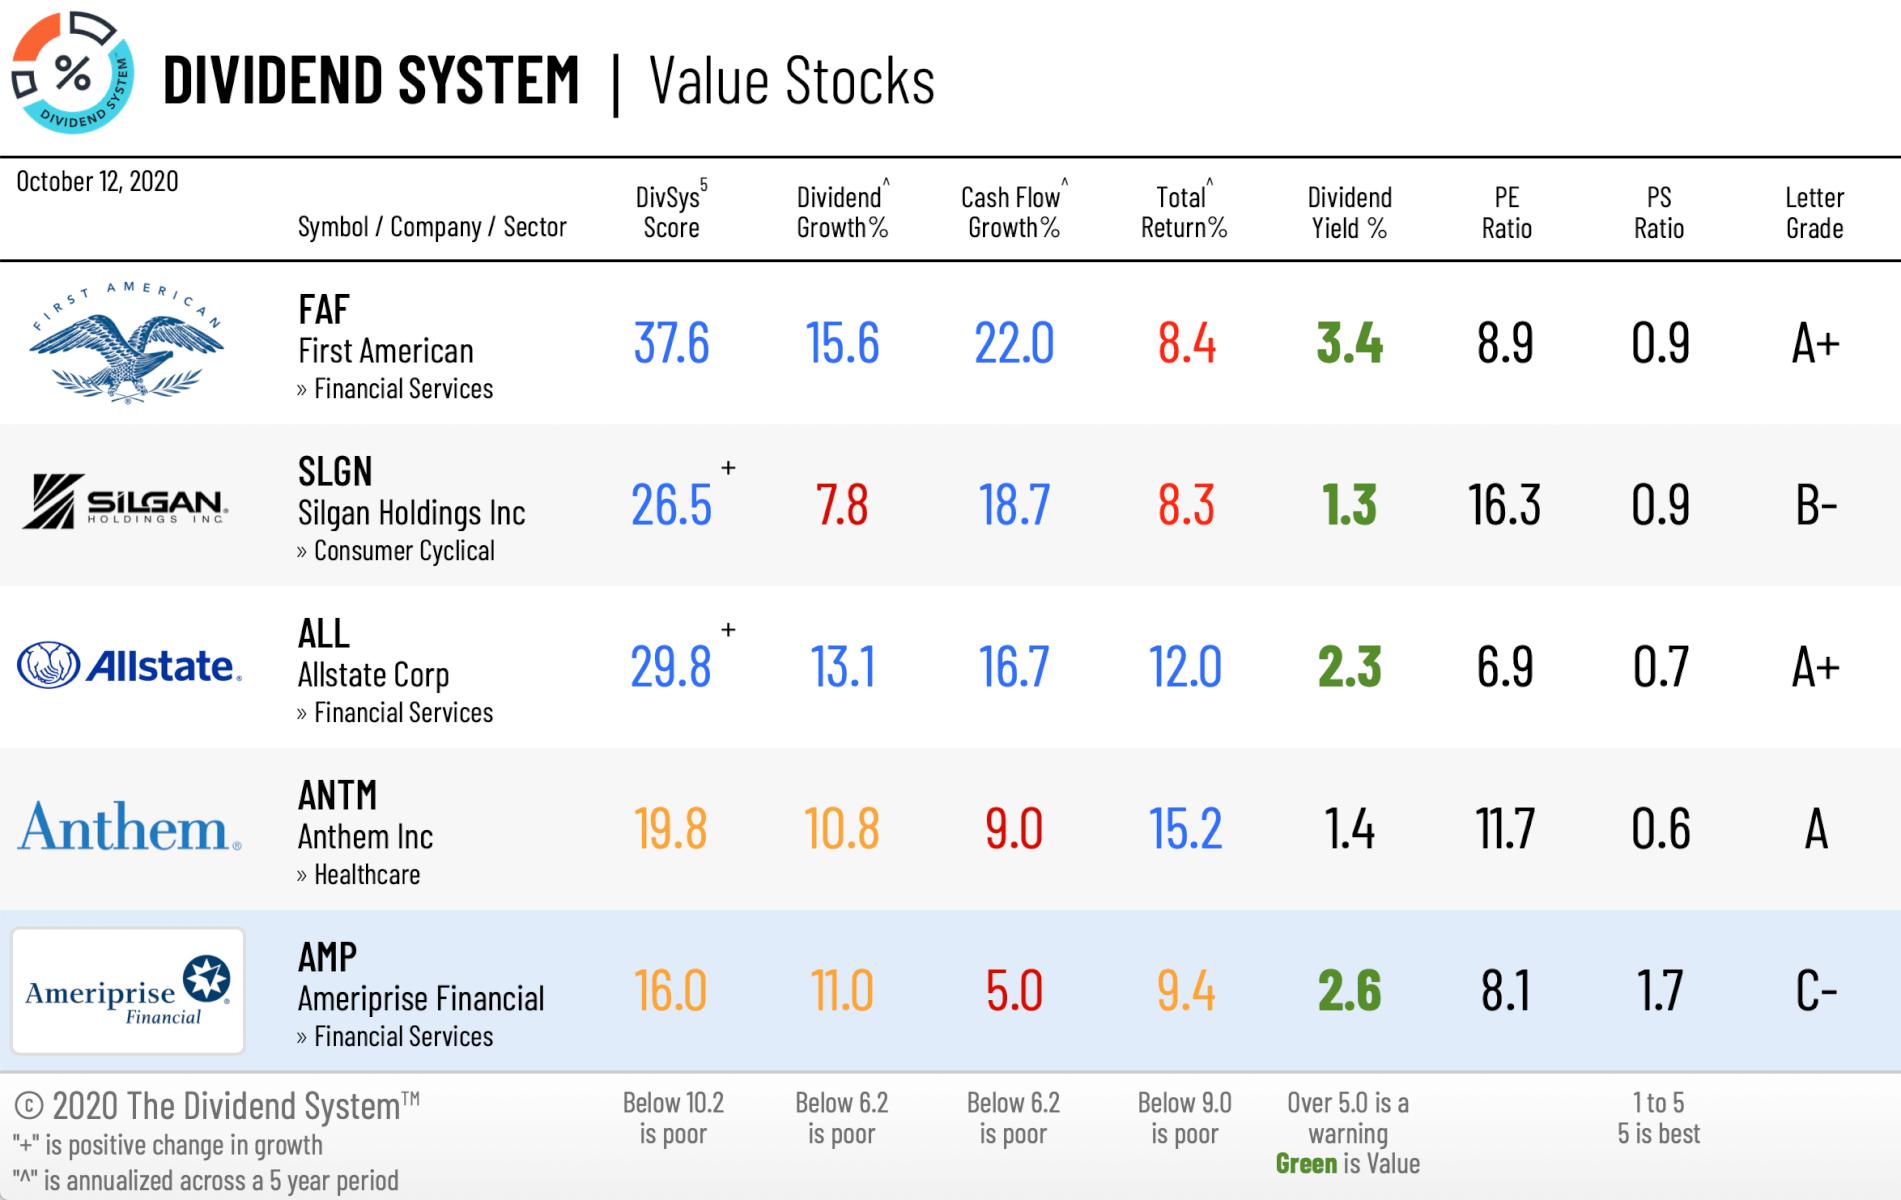 5 Value Stocks